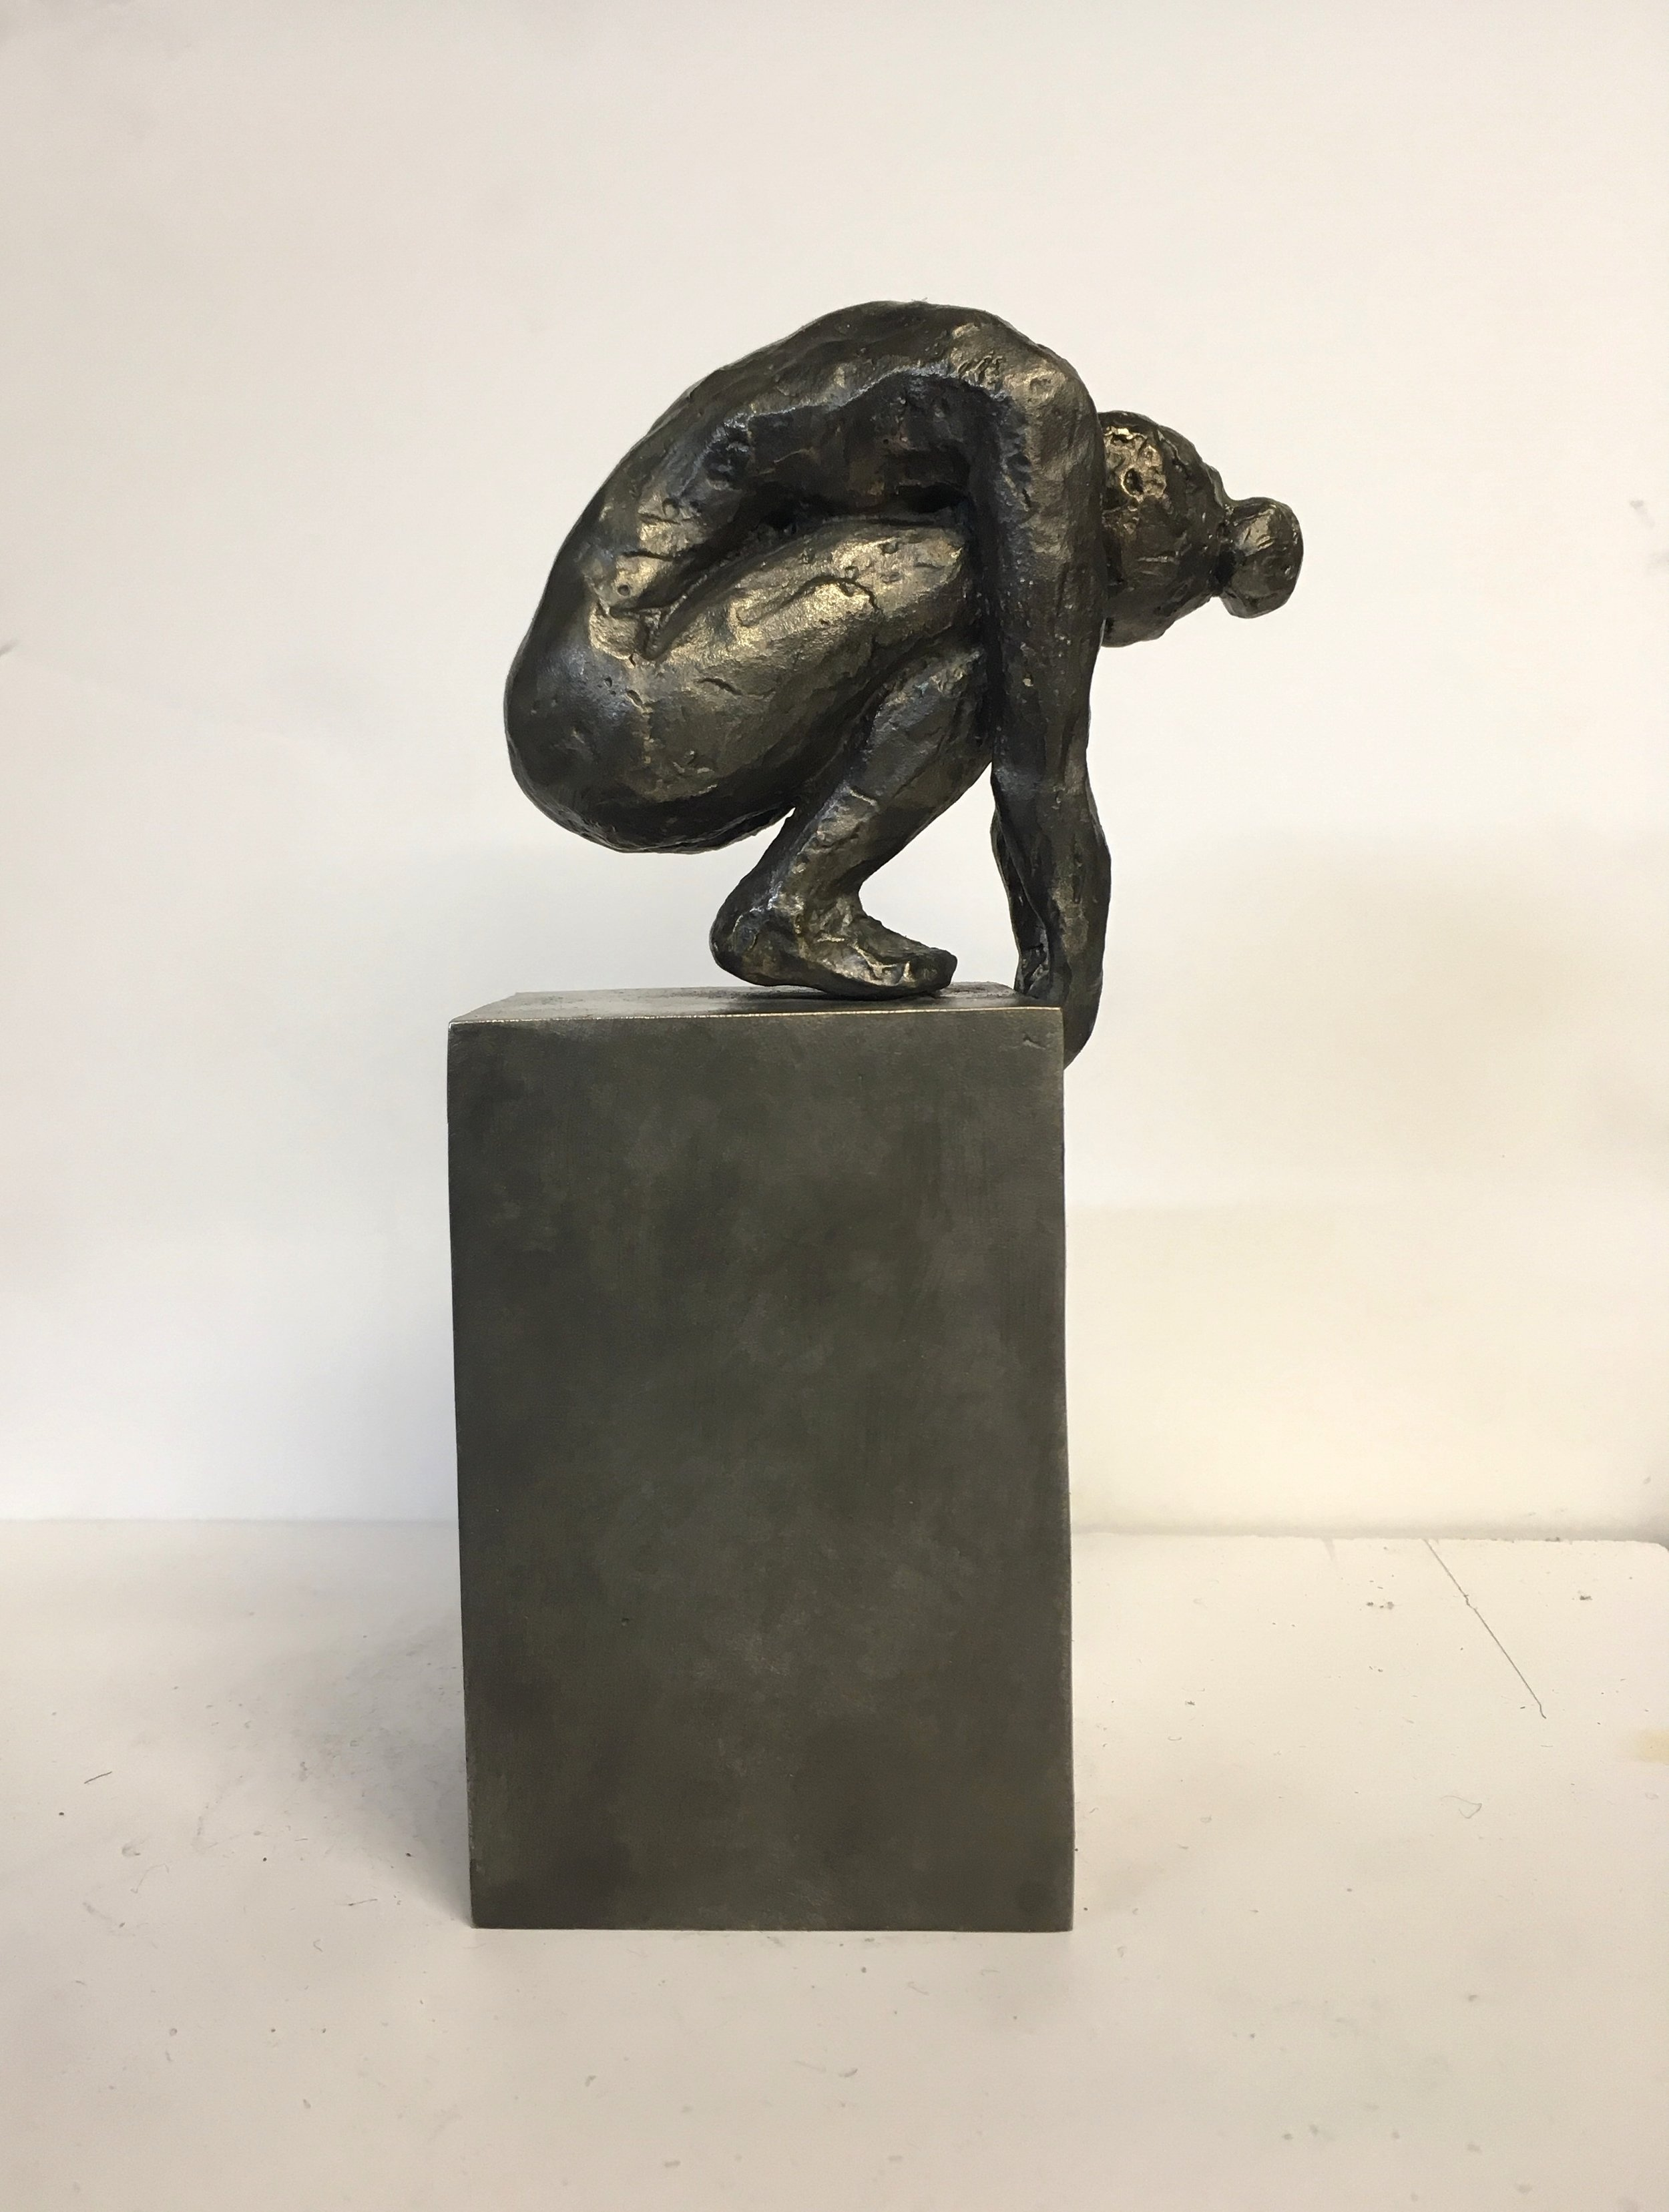 "Fiddlehead, 7.5x4x2.5"", Bronze, 2018 (Edition of 6)"